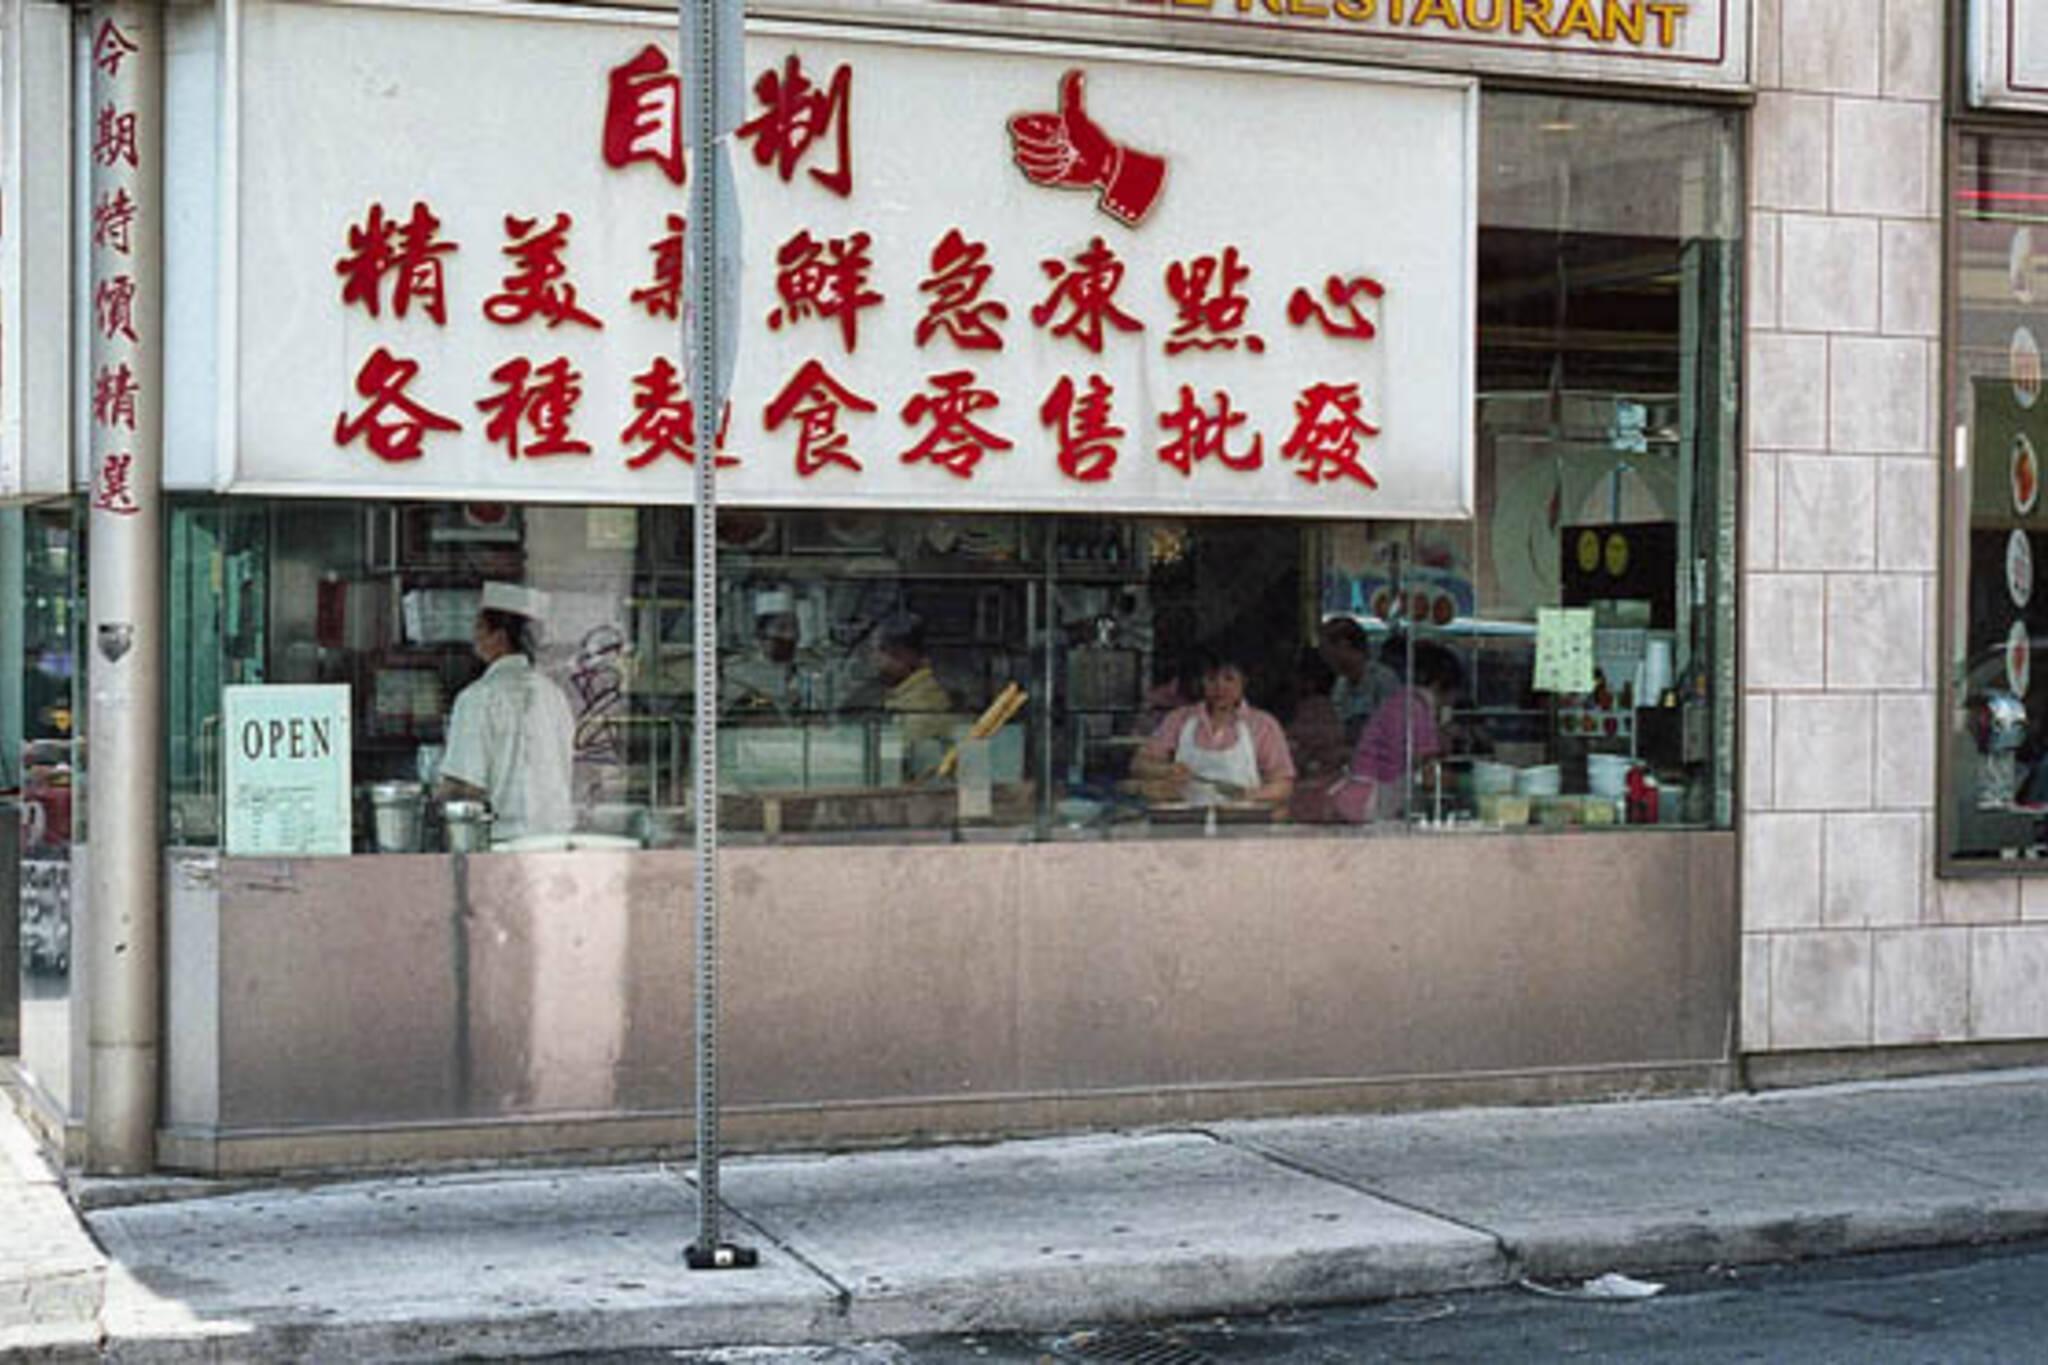 toronto kensington diner asian